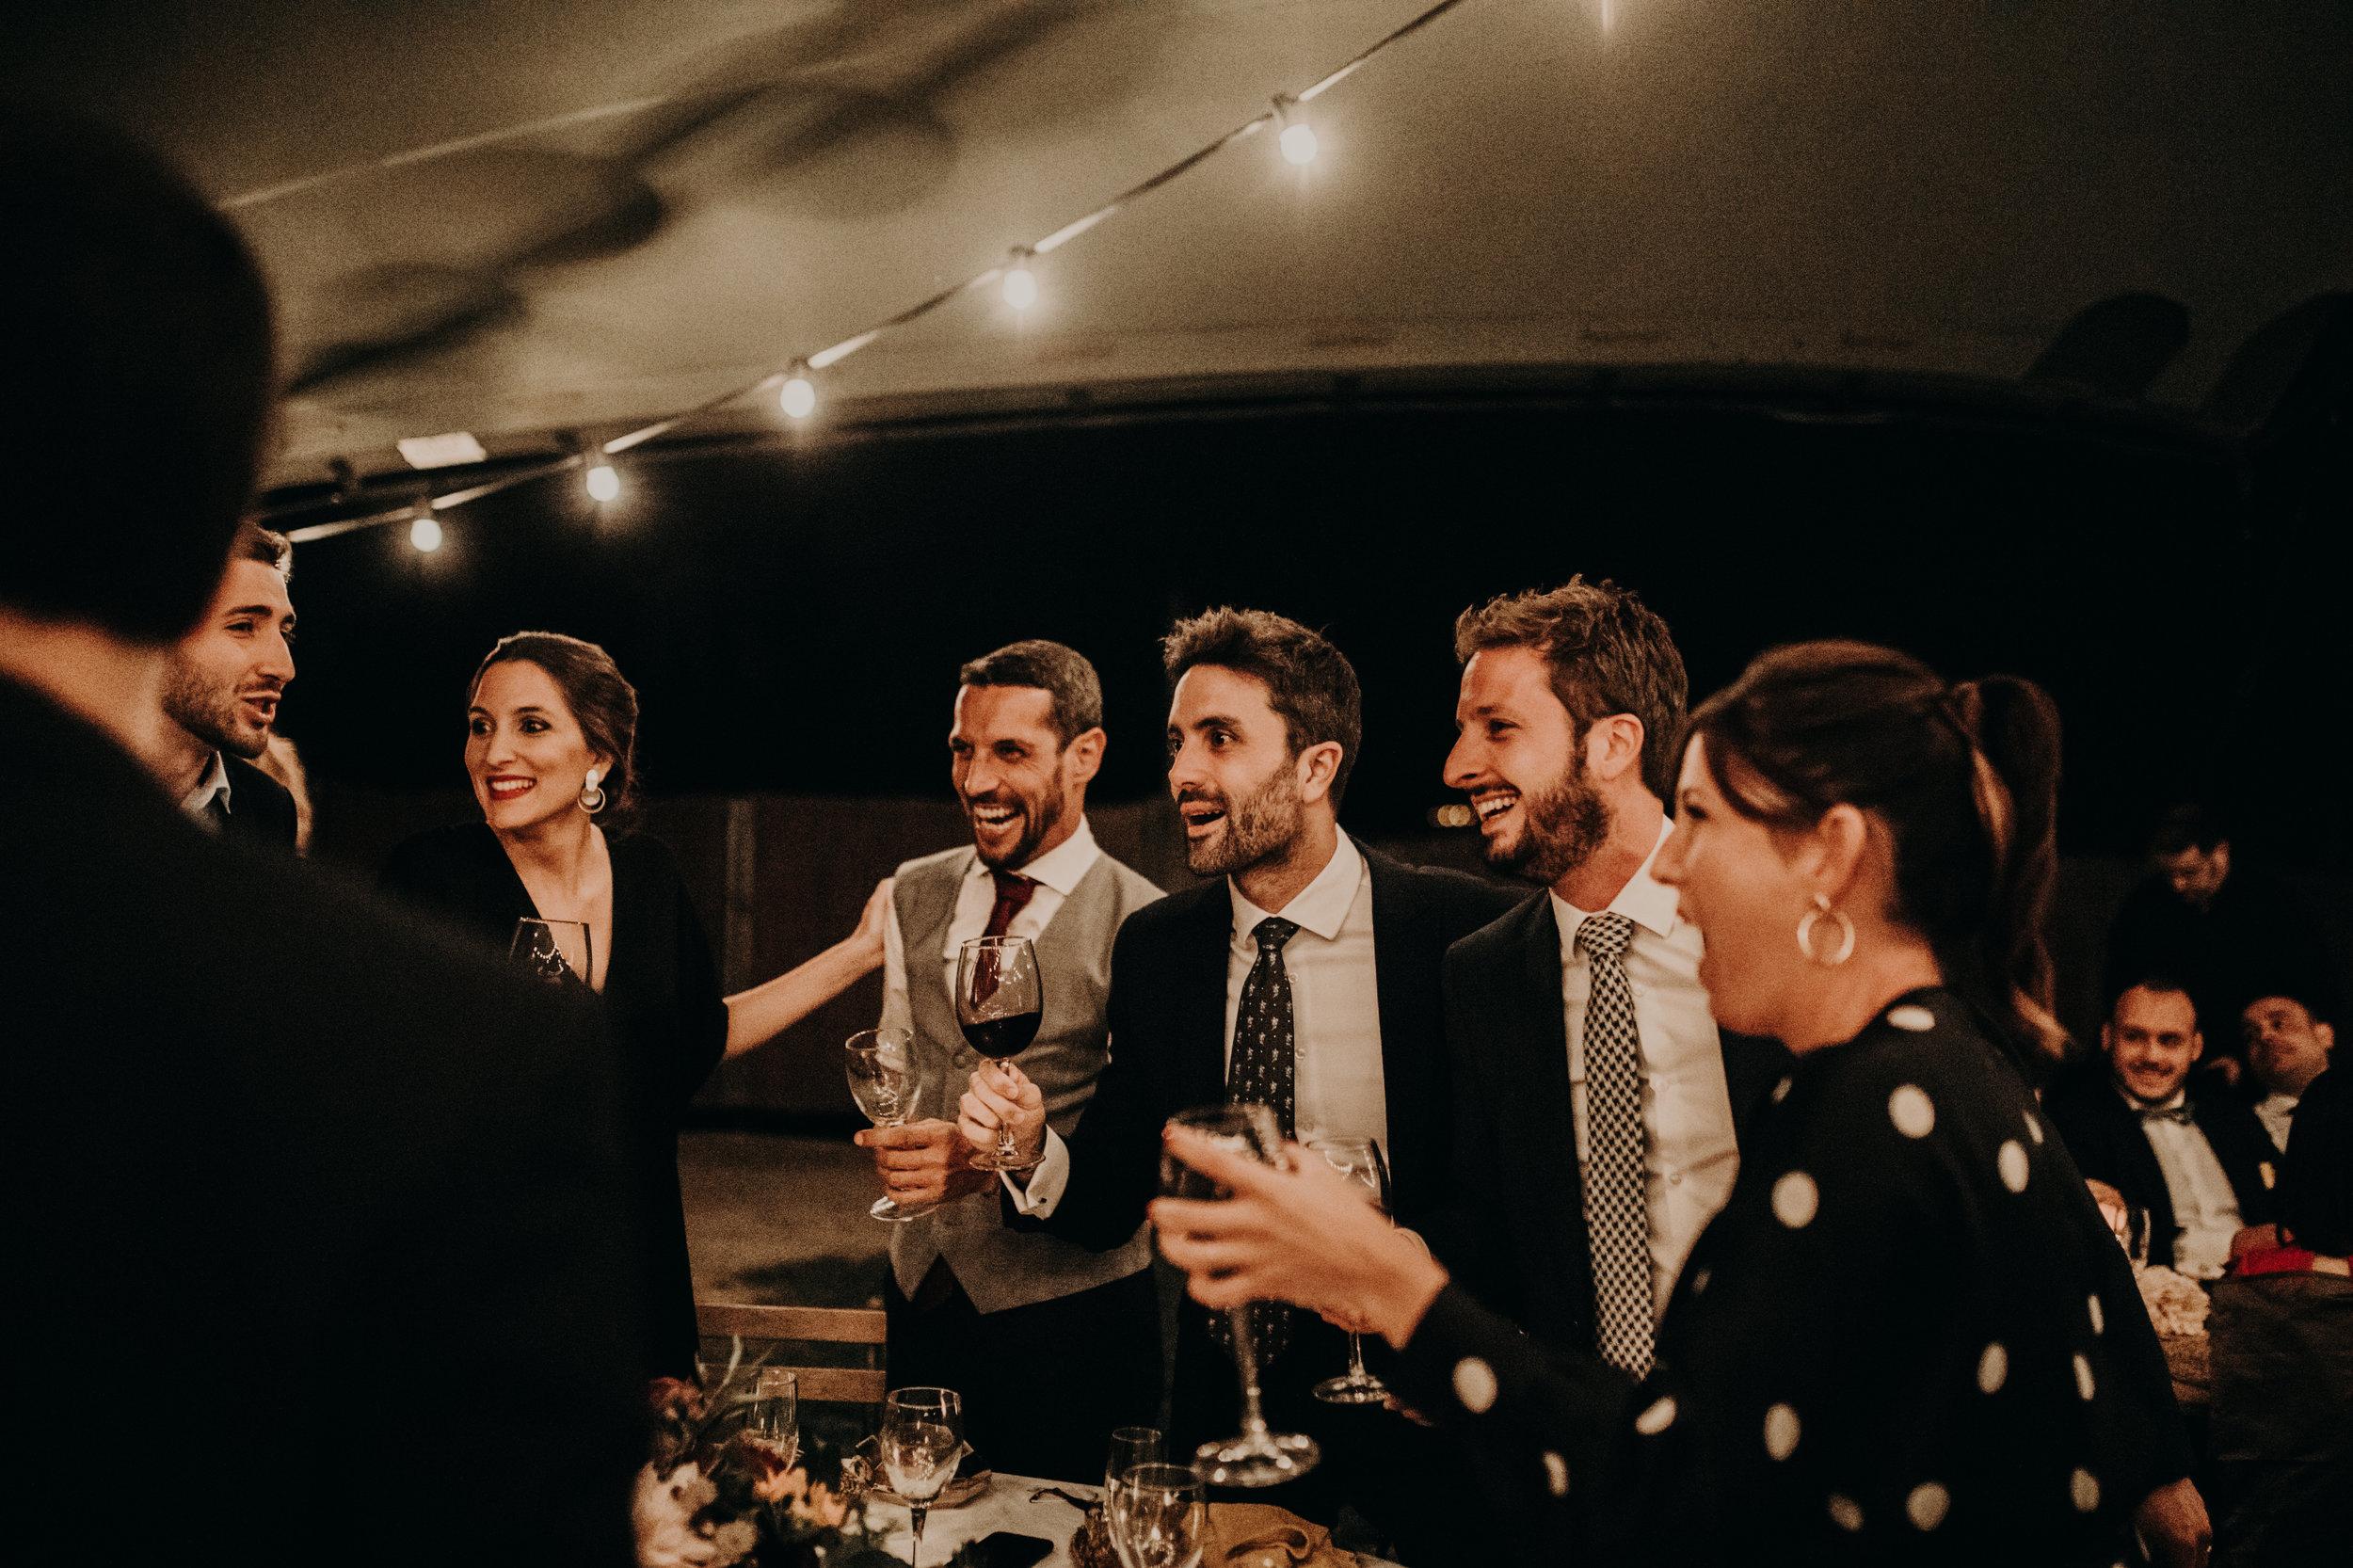 thenortherngirlphotography-fotografa-de-bodas-barcelona_destinartion-wedding-photographer_wedding-photographer_moroccan-wedding_HADNANANTIGONA-1280.jpg